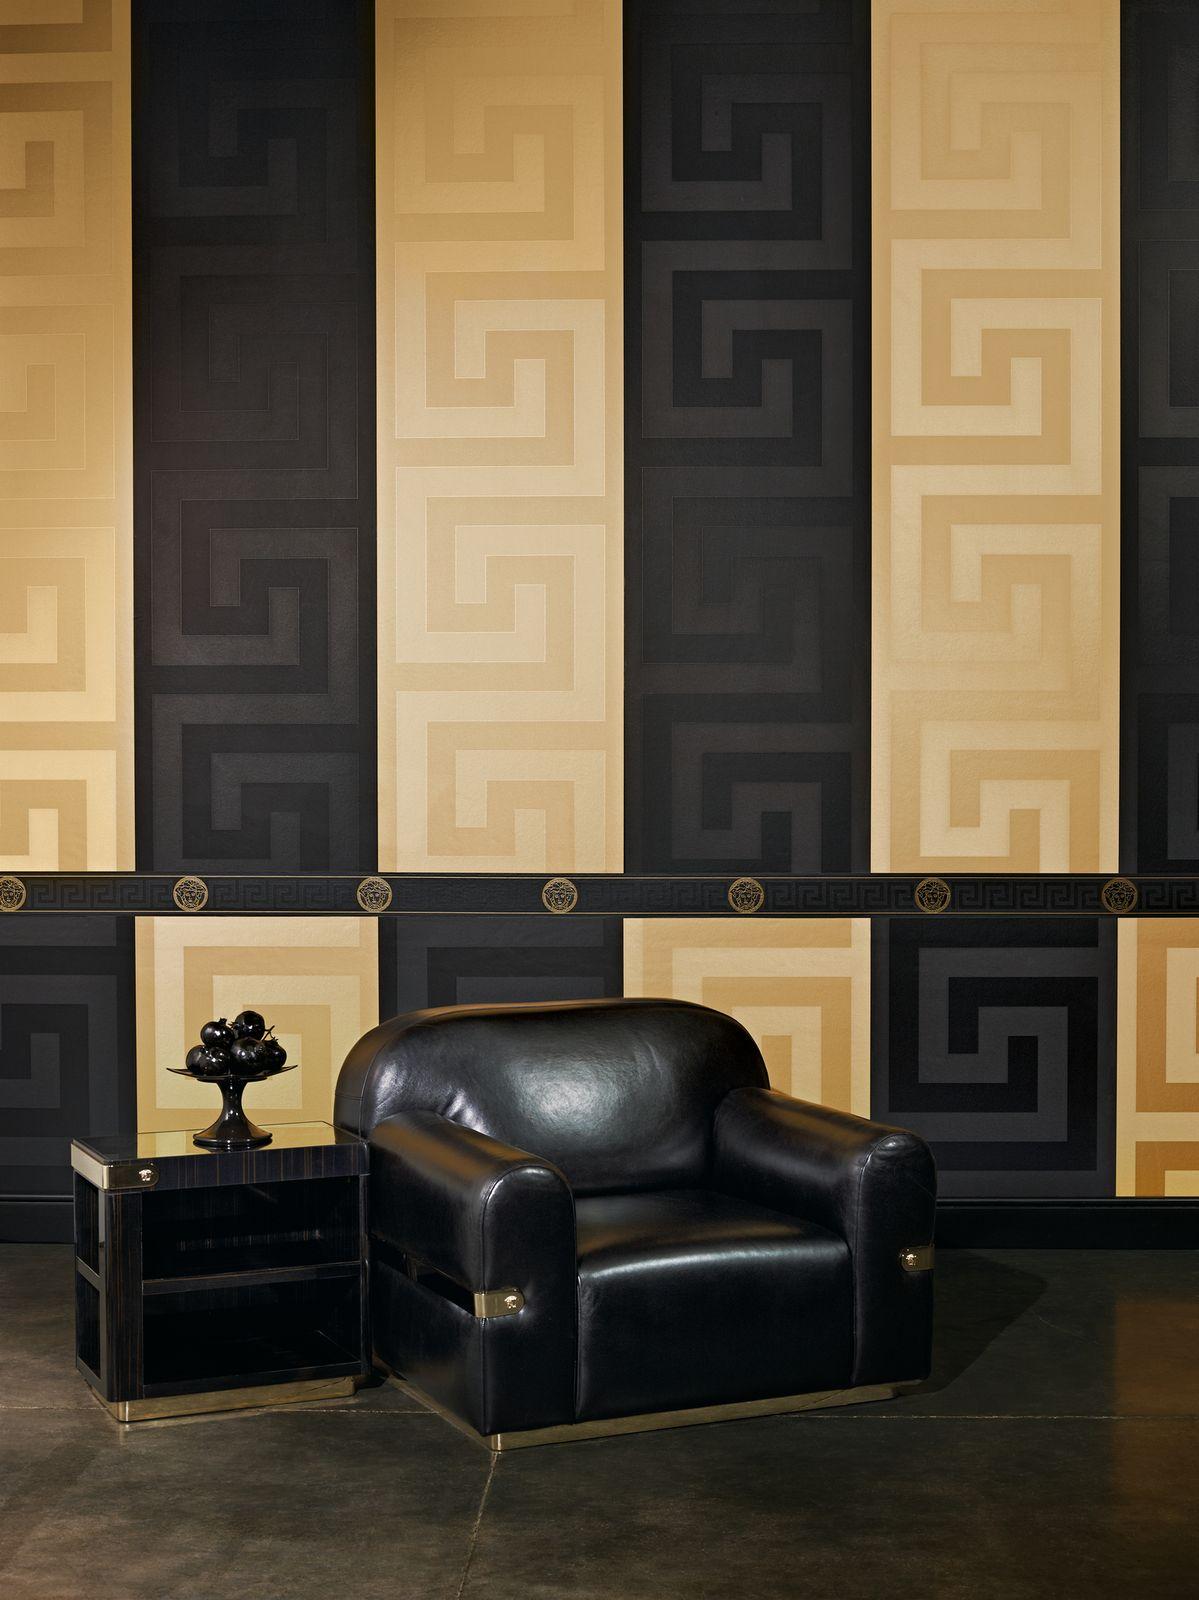 Versace Home Tapete Vlies Griechisch gold Glanz 93523-2 9,89€//1qm